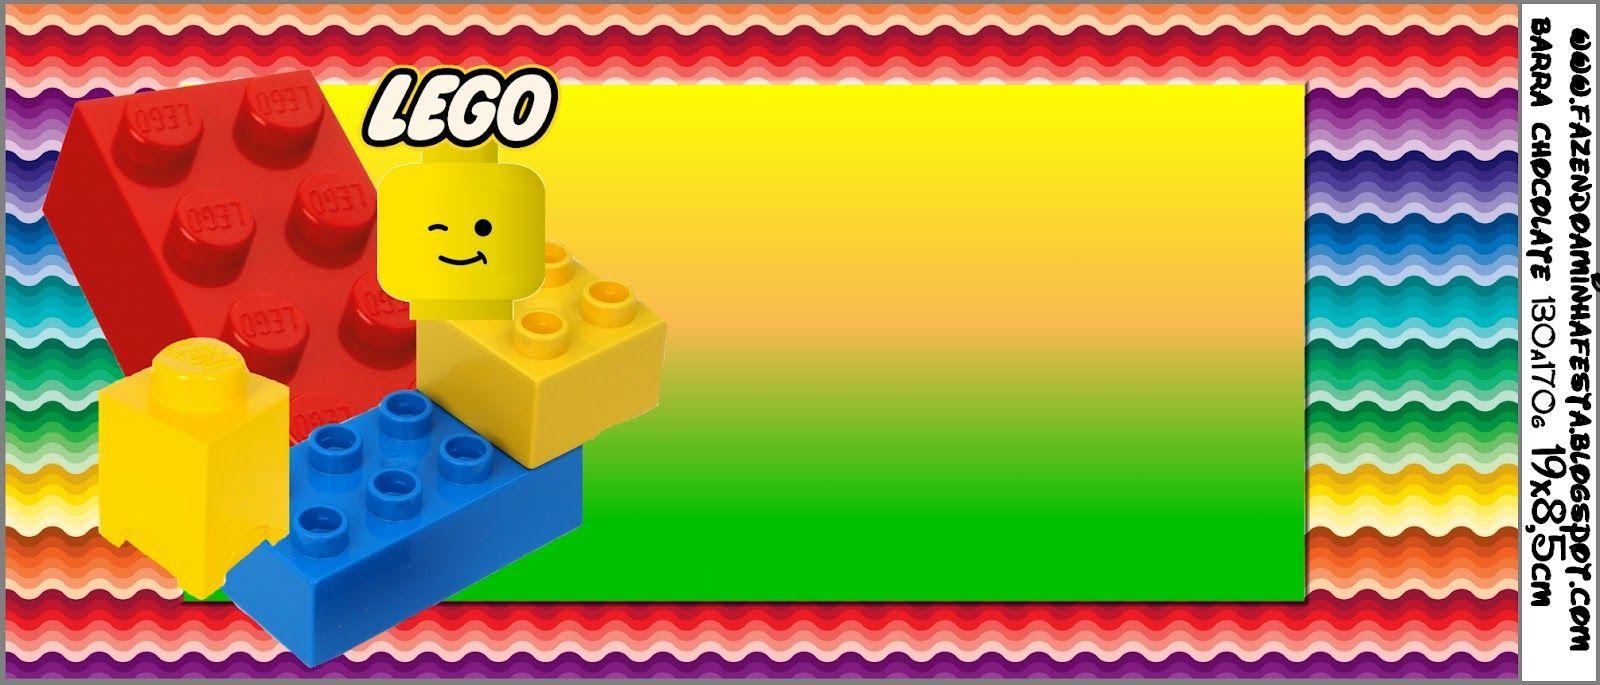 Lego Kit Completo Com Molduras Para Convites Rótulos Para